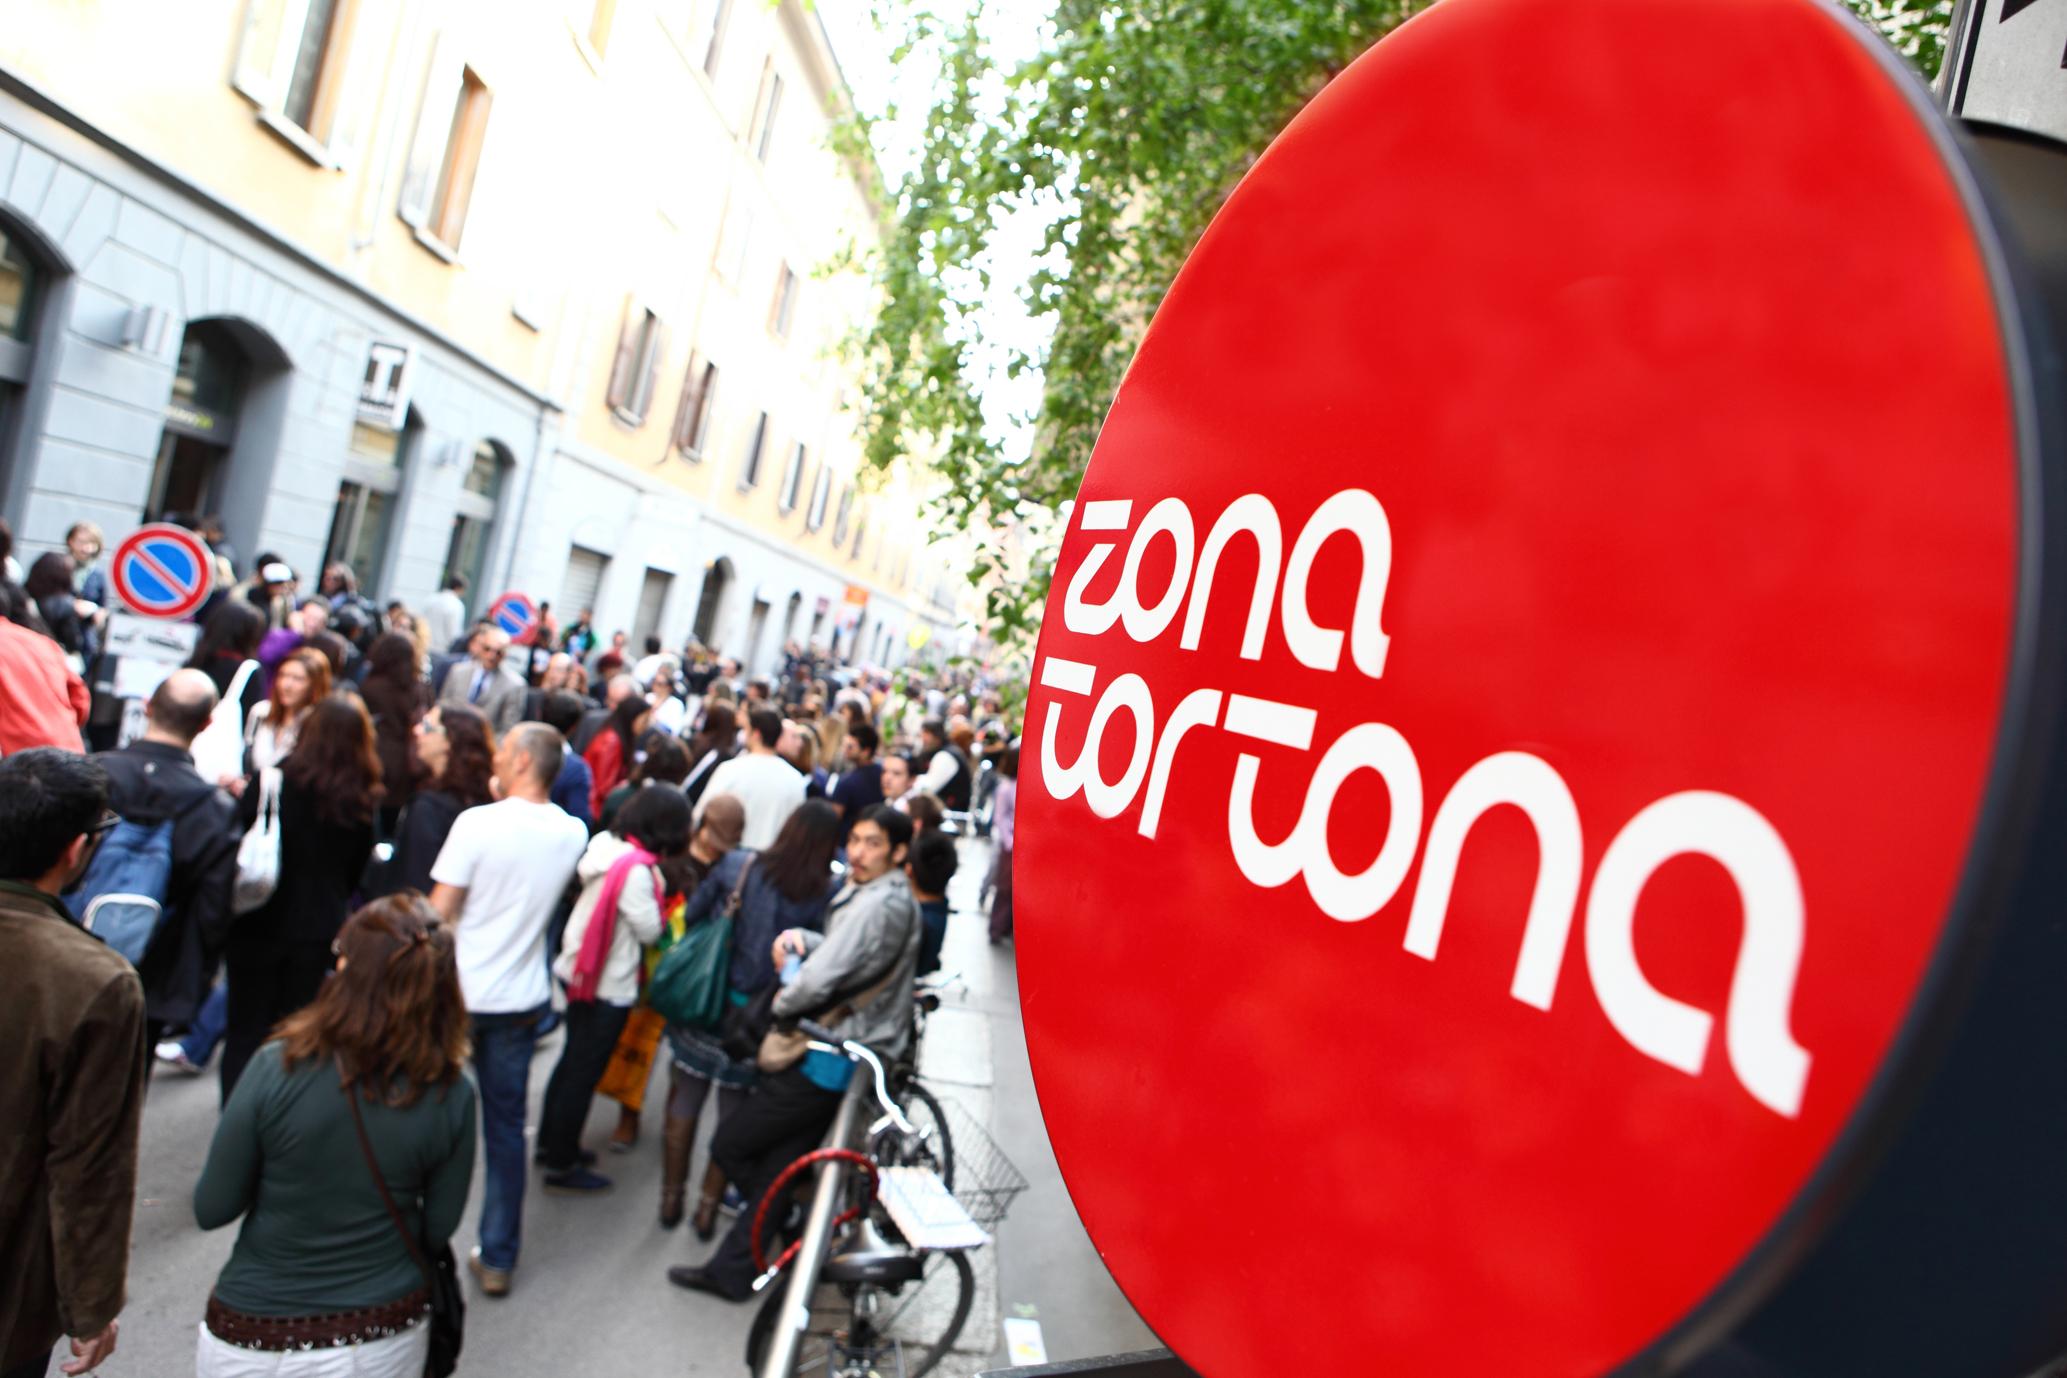 Zona-Tortona-fuori-salone-2014-amearquitetura